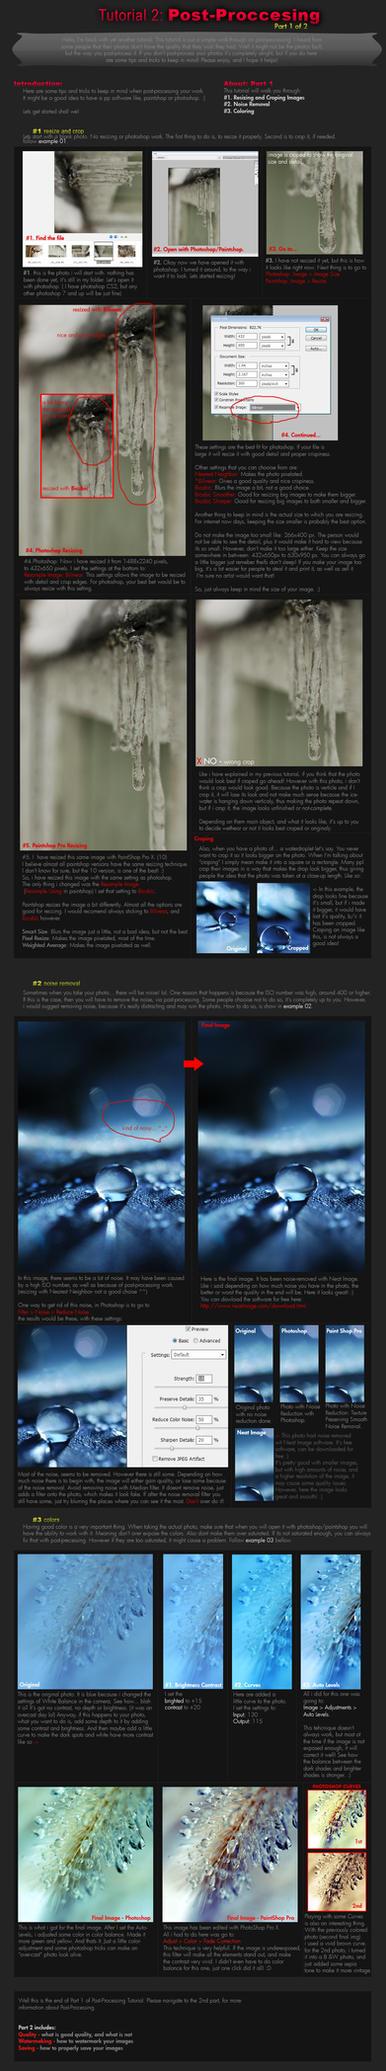 Tutorial 2: Post-Processing P1 by onixa